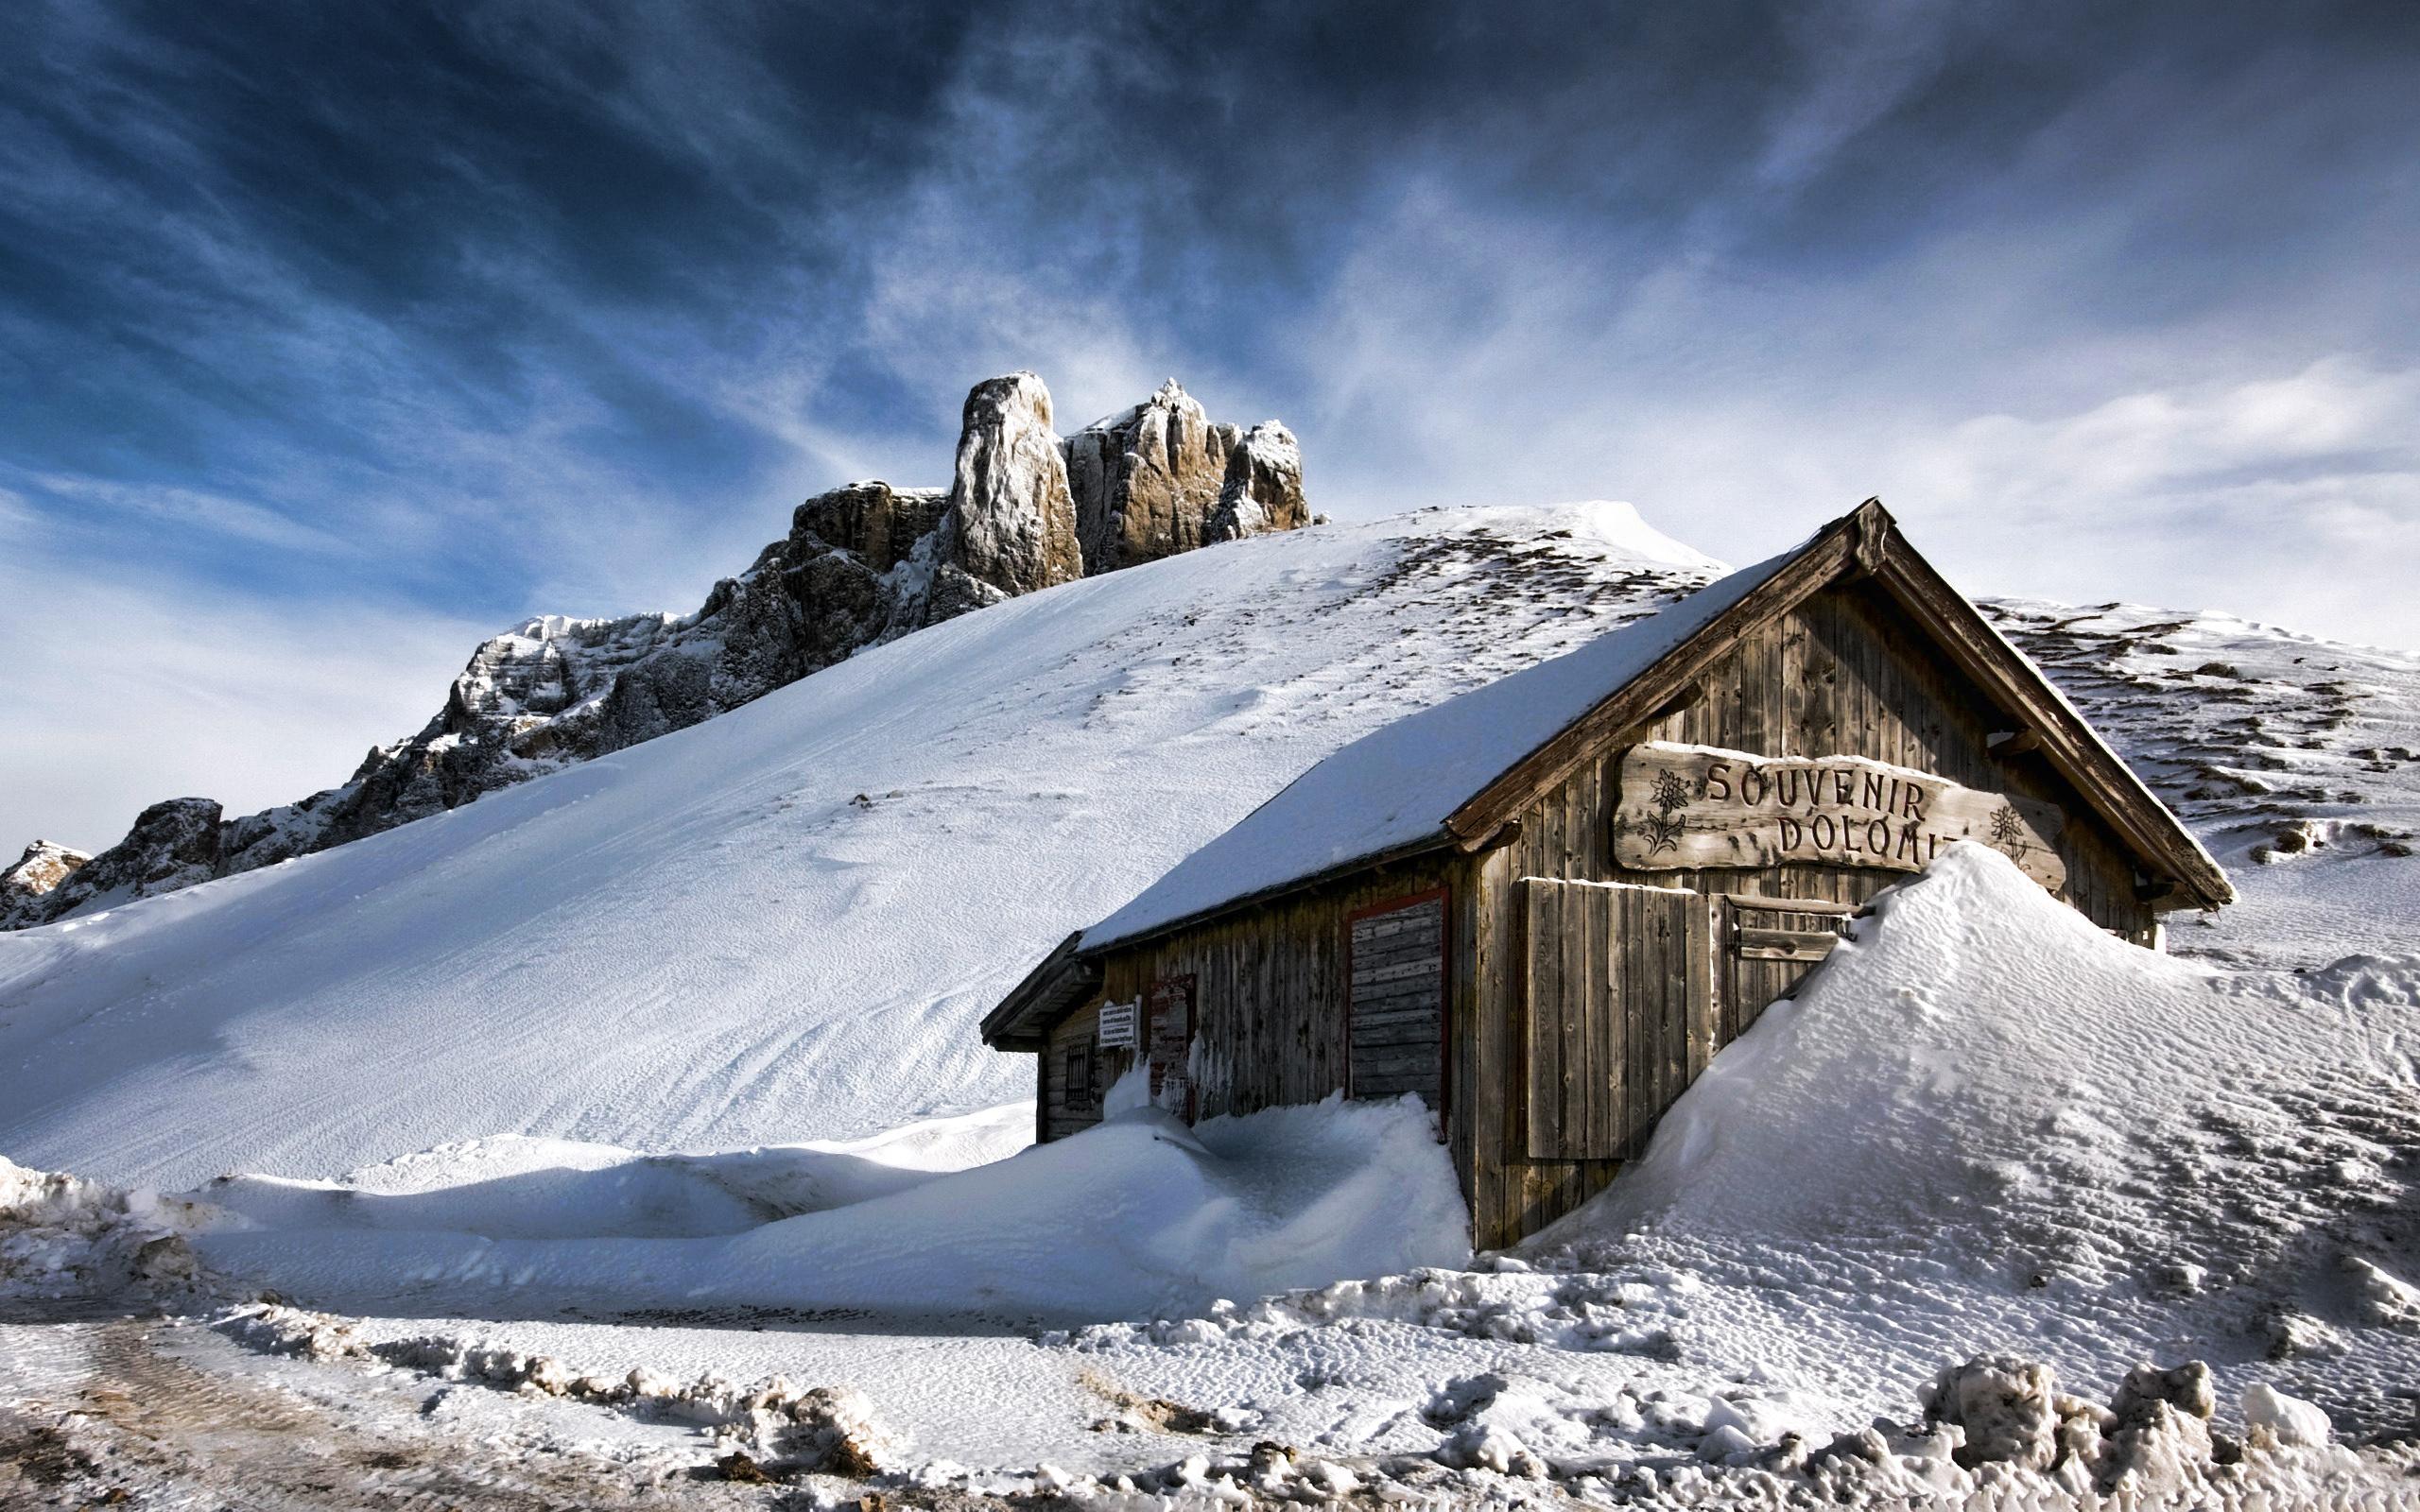 Mountains in winter Desktop Wallpapers FREE on Latorocom 2560x1600